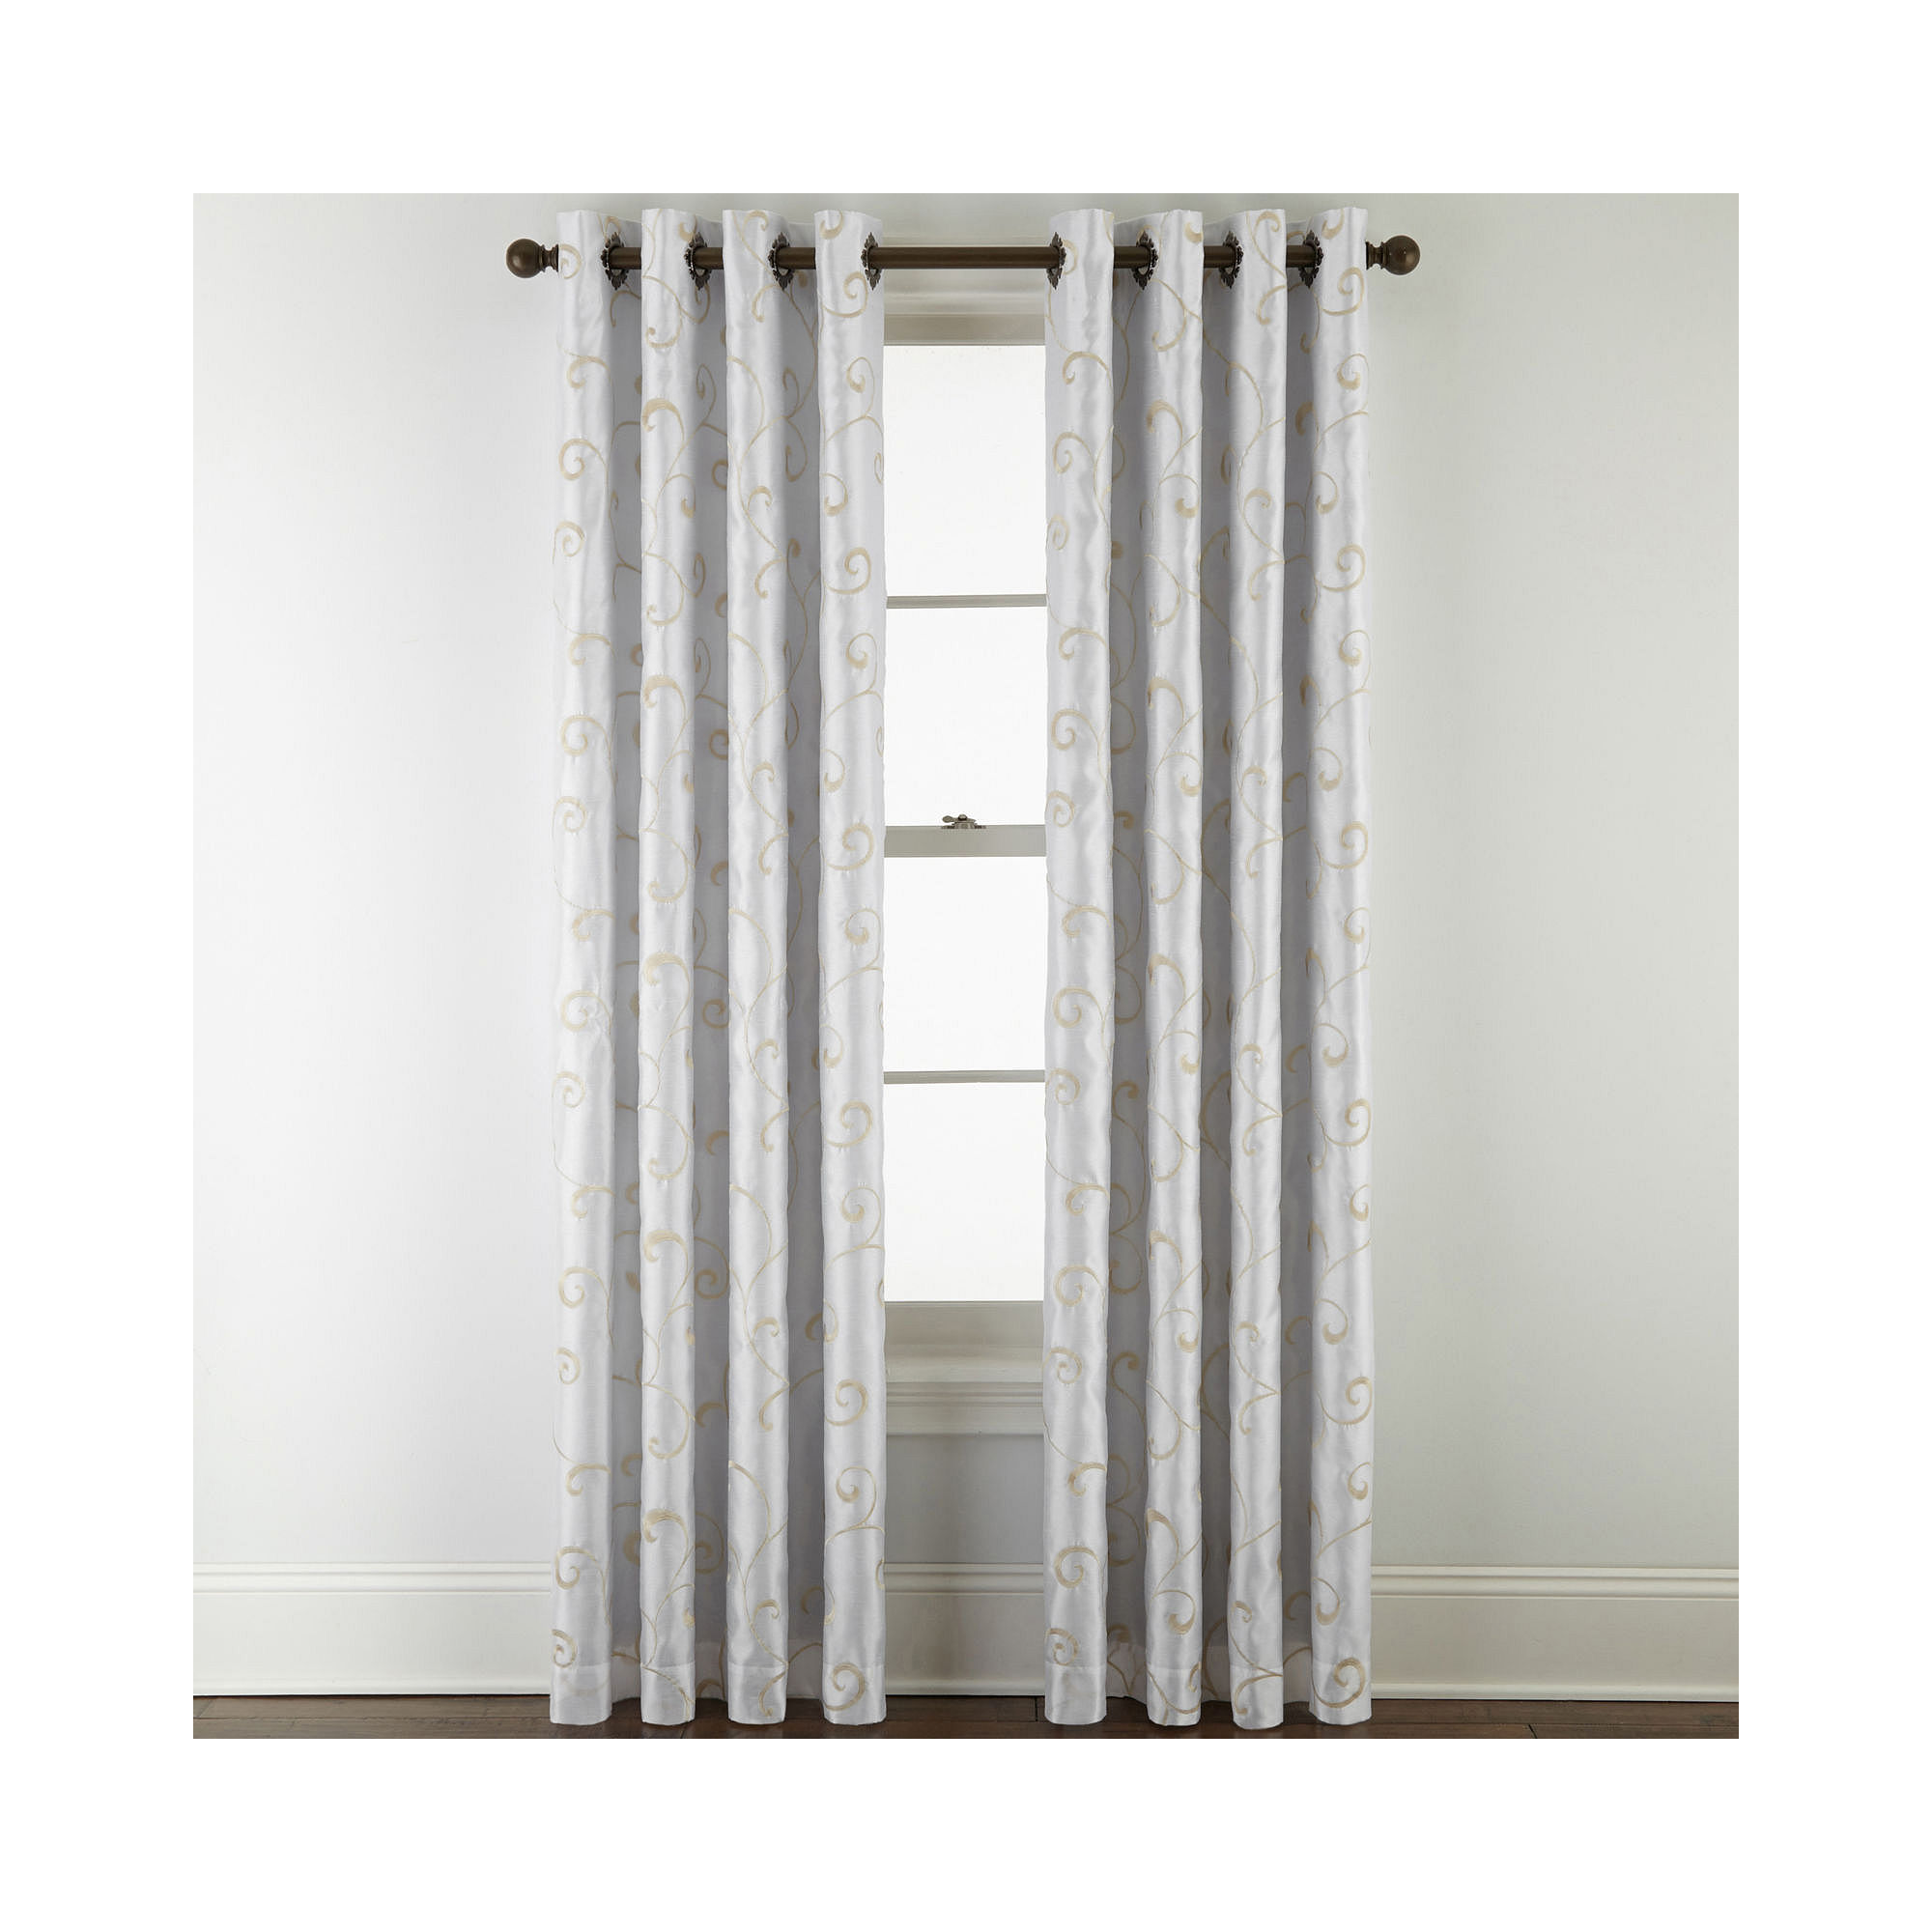 Upc 073182200018 Royal Velvet Plaza Embroidery Blackout Grommet Top 2 Pack Curtain Panels